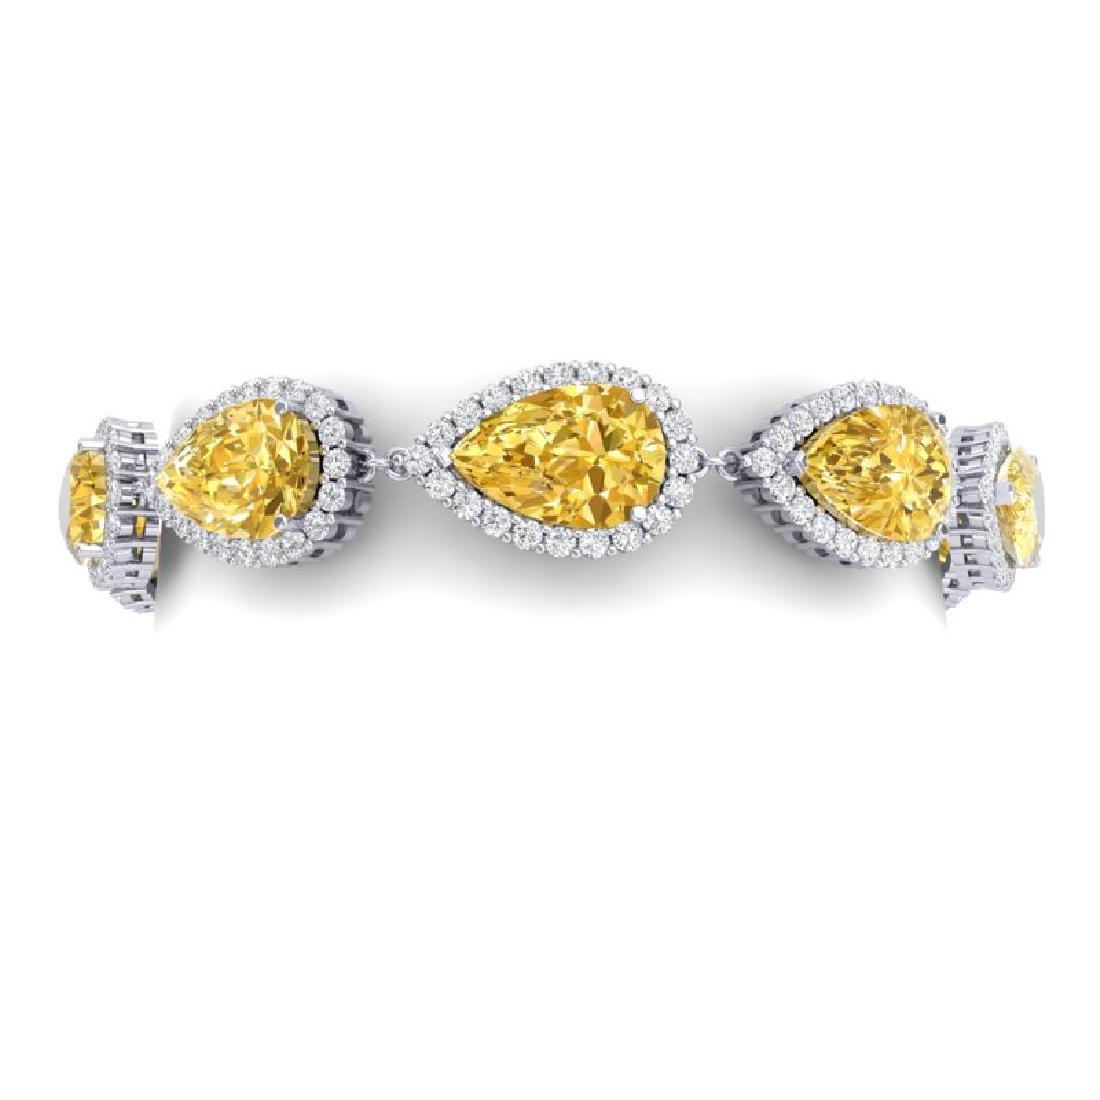 39.26 CTW Royalty Canary Citrine & VS Diamond Bracelet